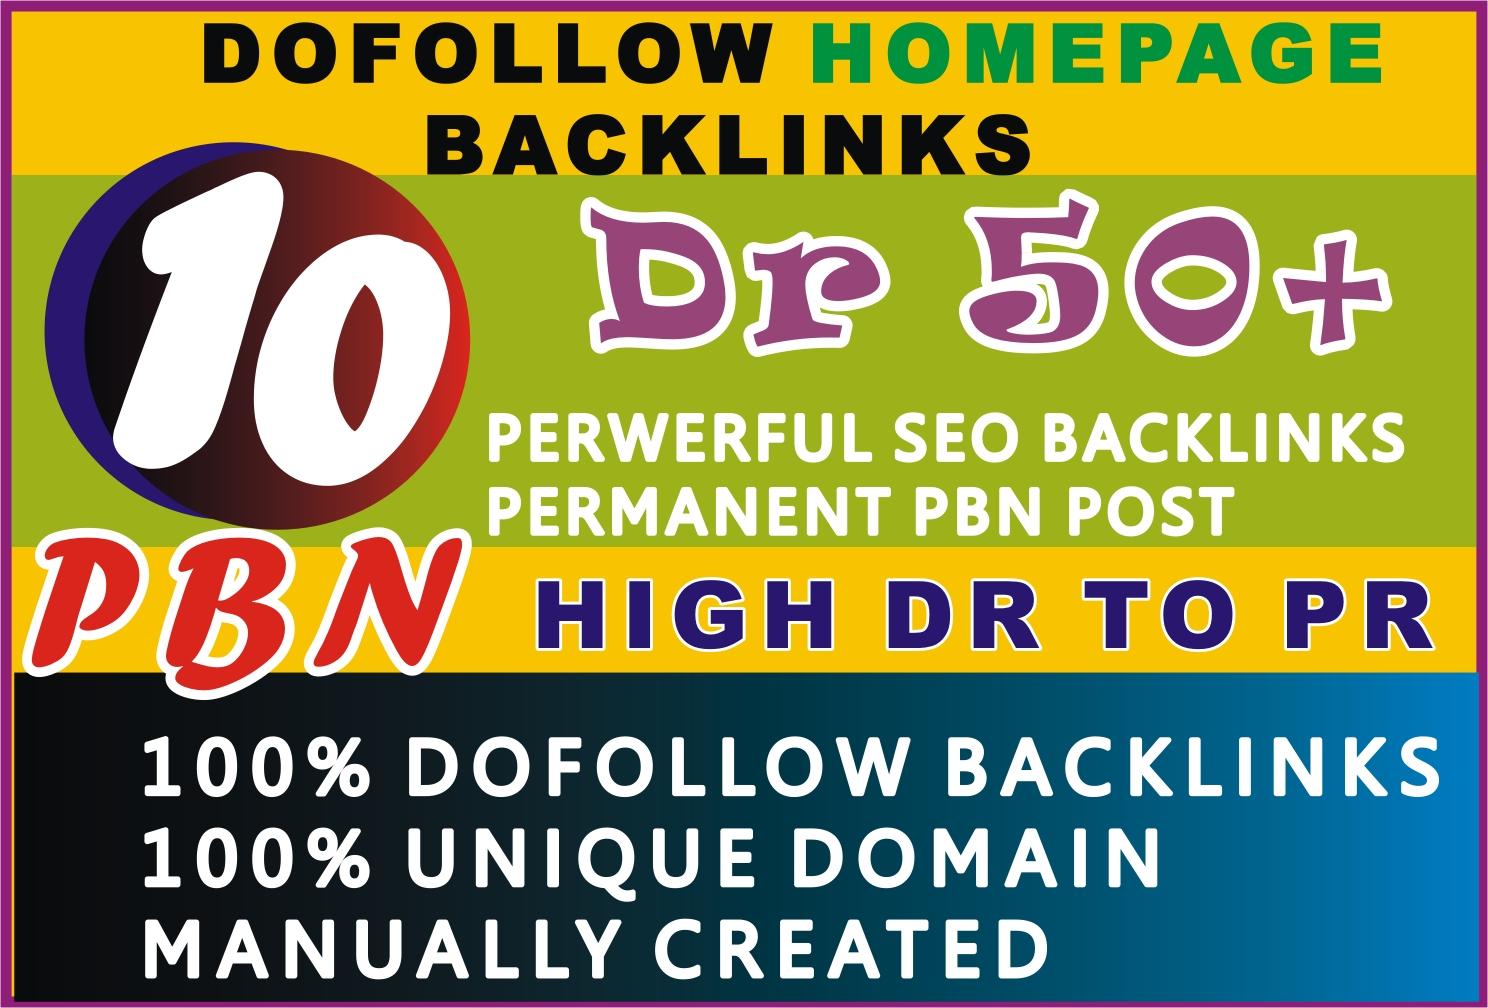 I will make unique 10 pbn dofollow permanent homepage backlinks